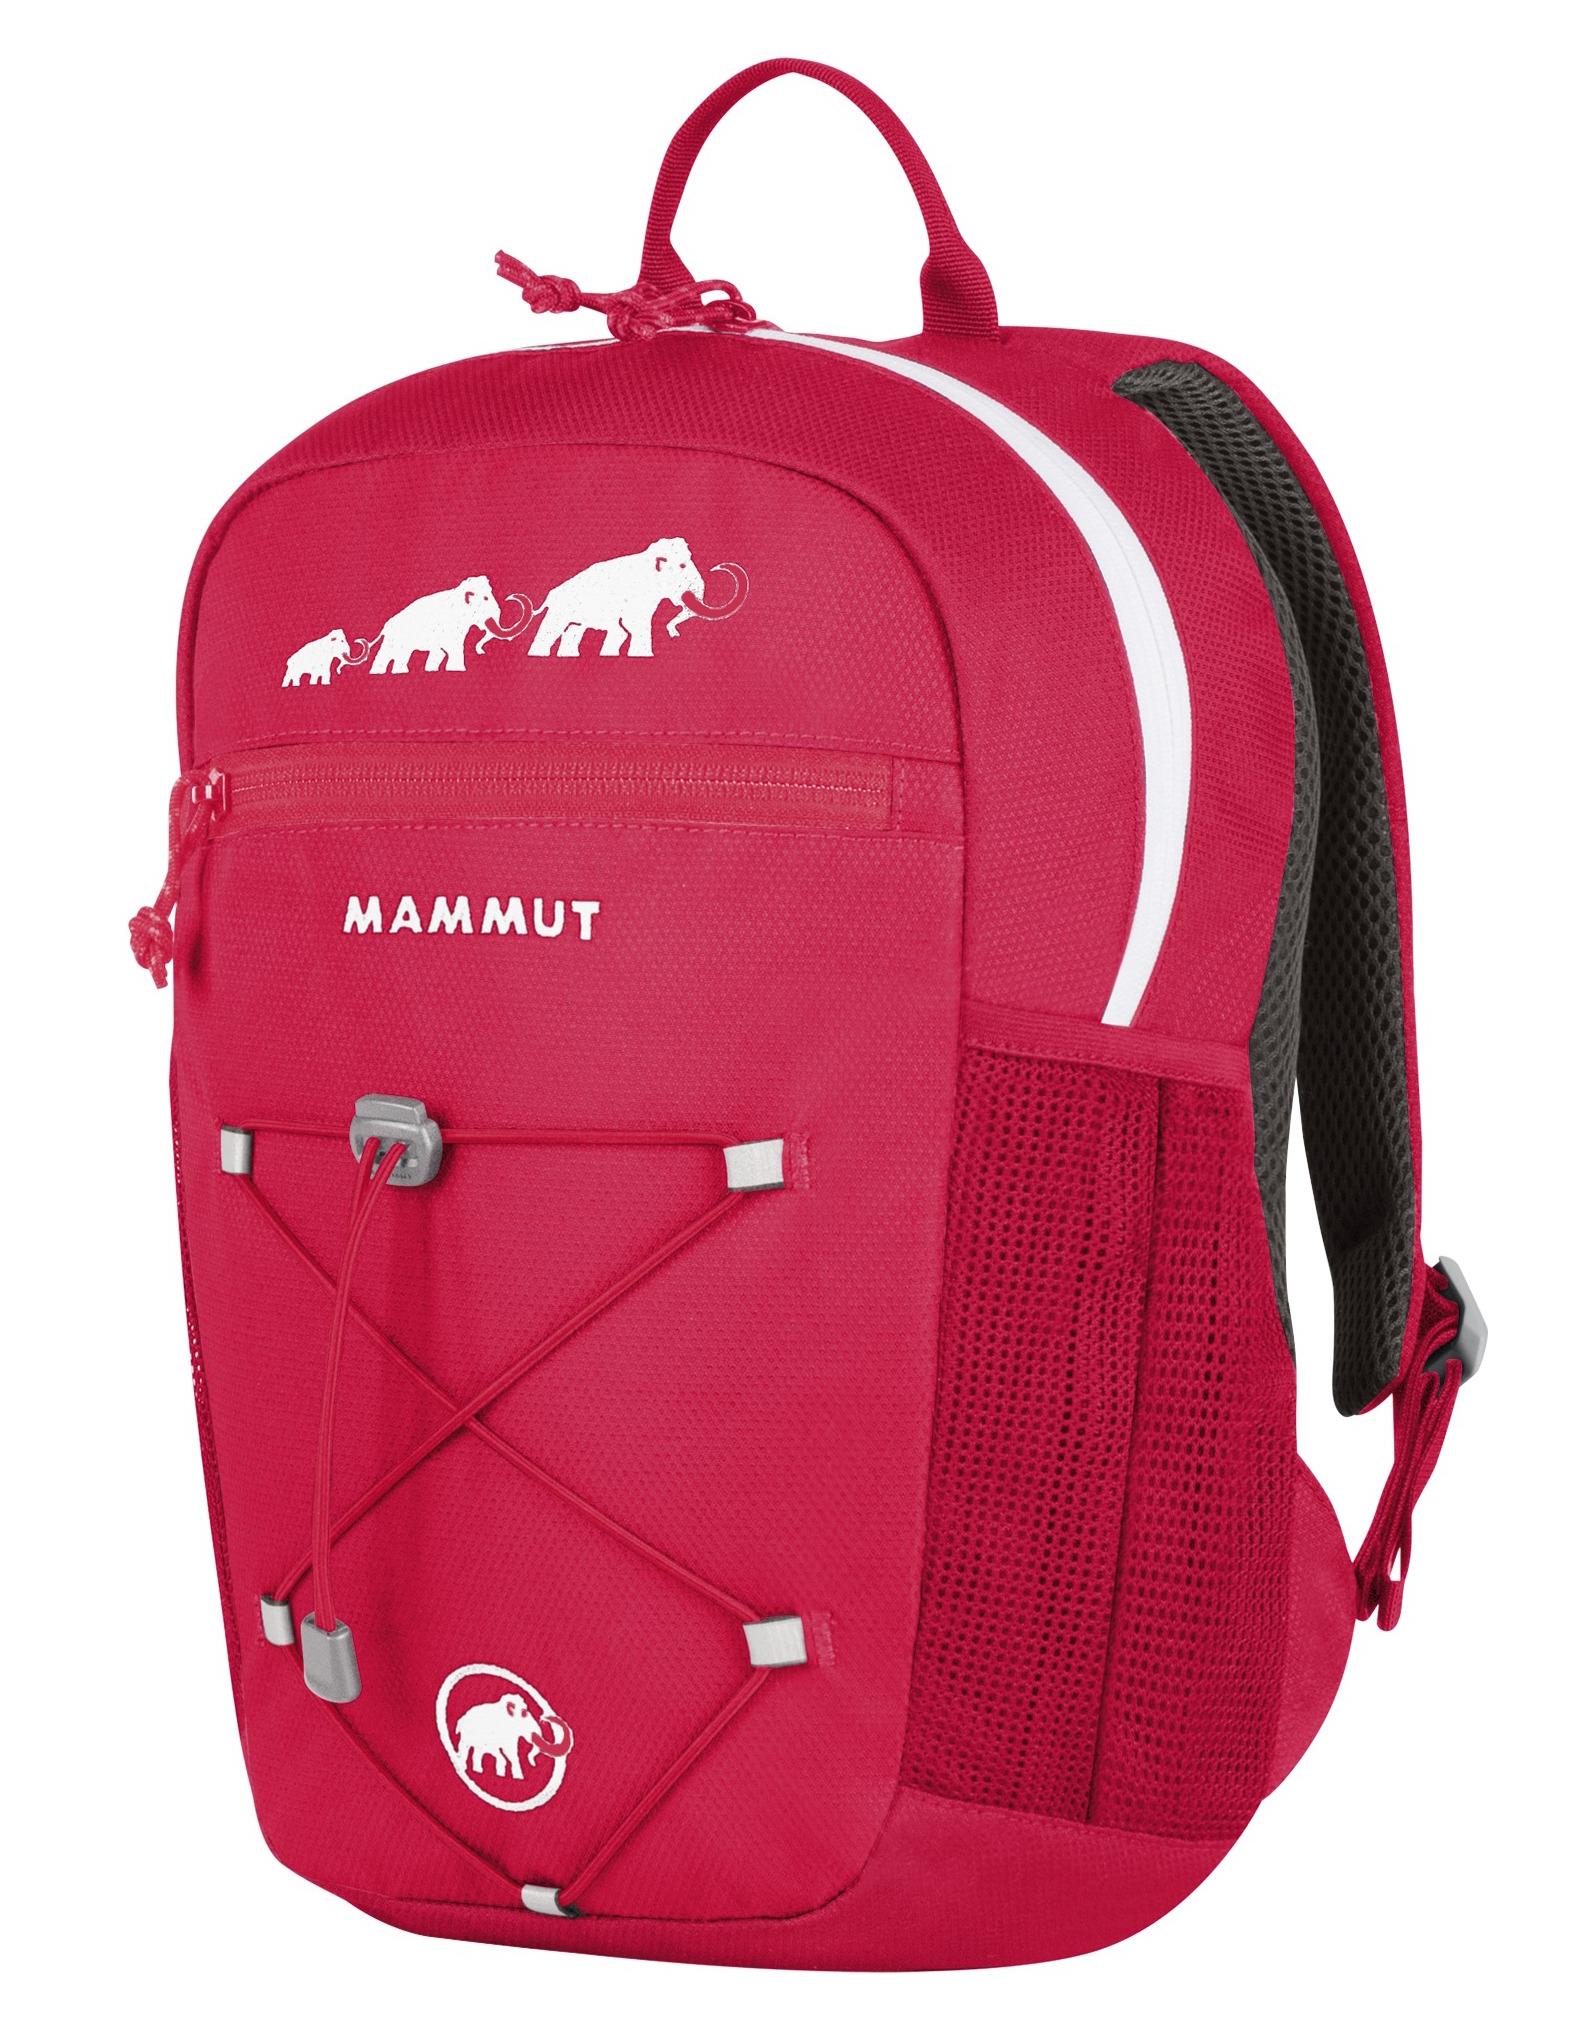 Mammut - First Zip - Mochila - Niños